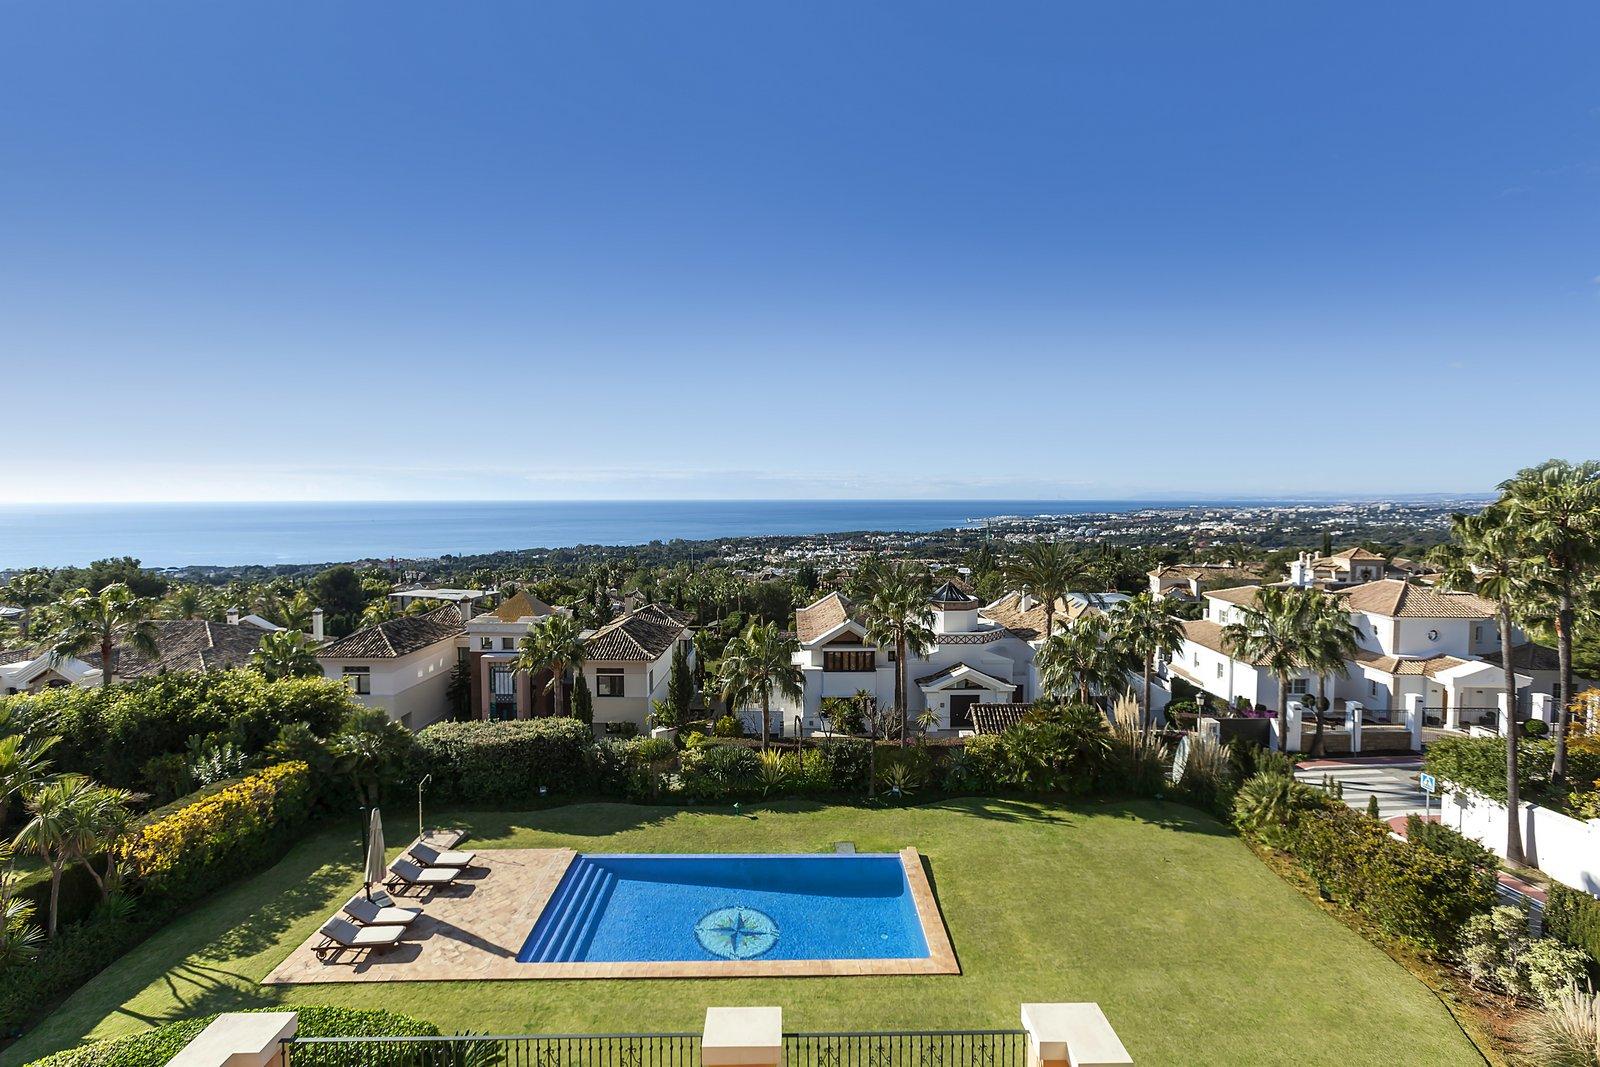 Luxury Villa Sierra Blanca Sea View Marbella